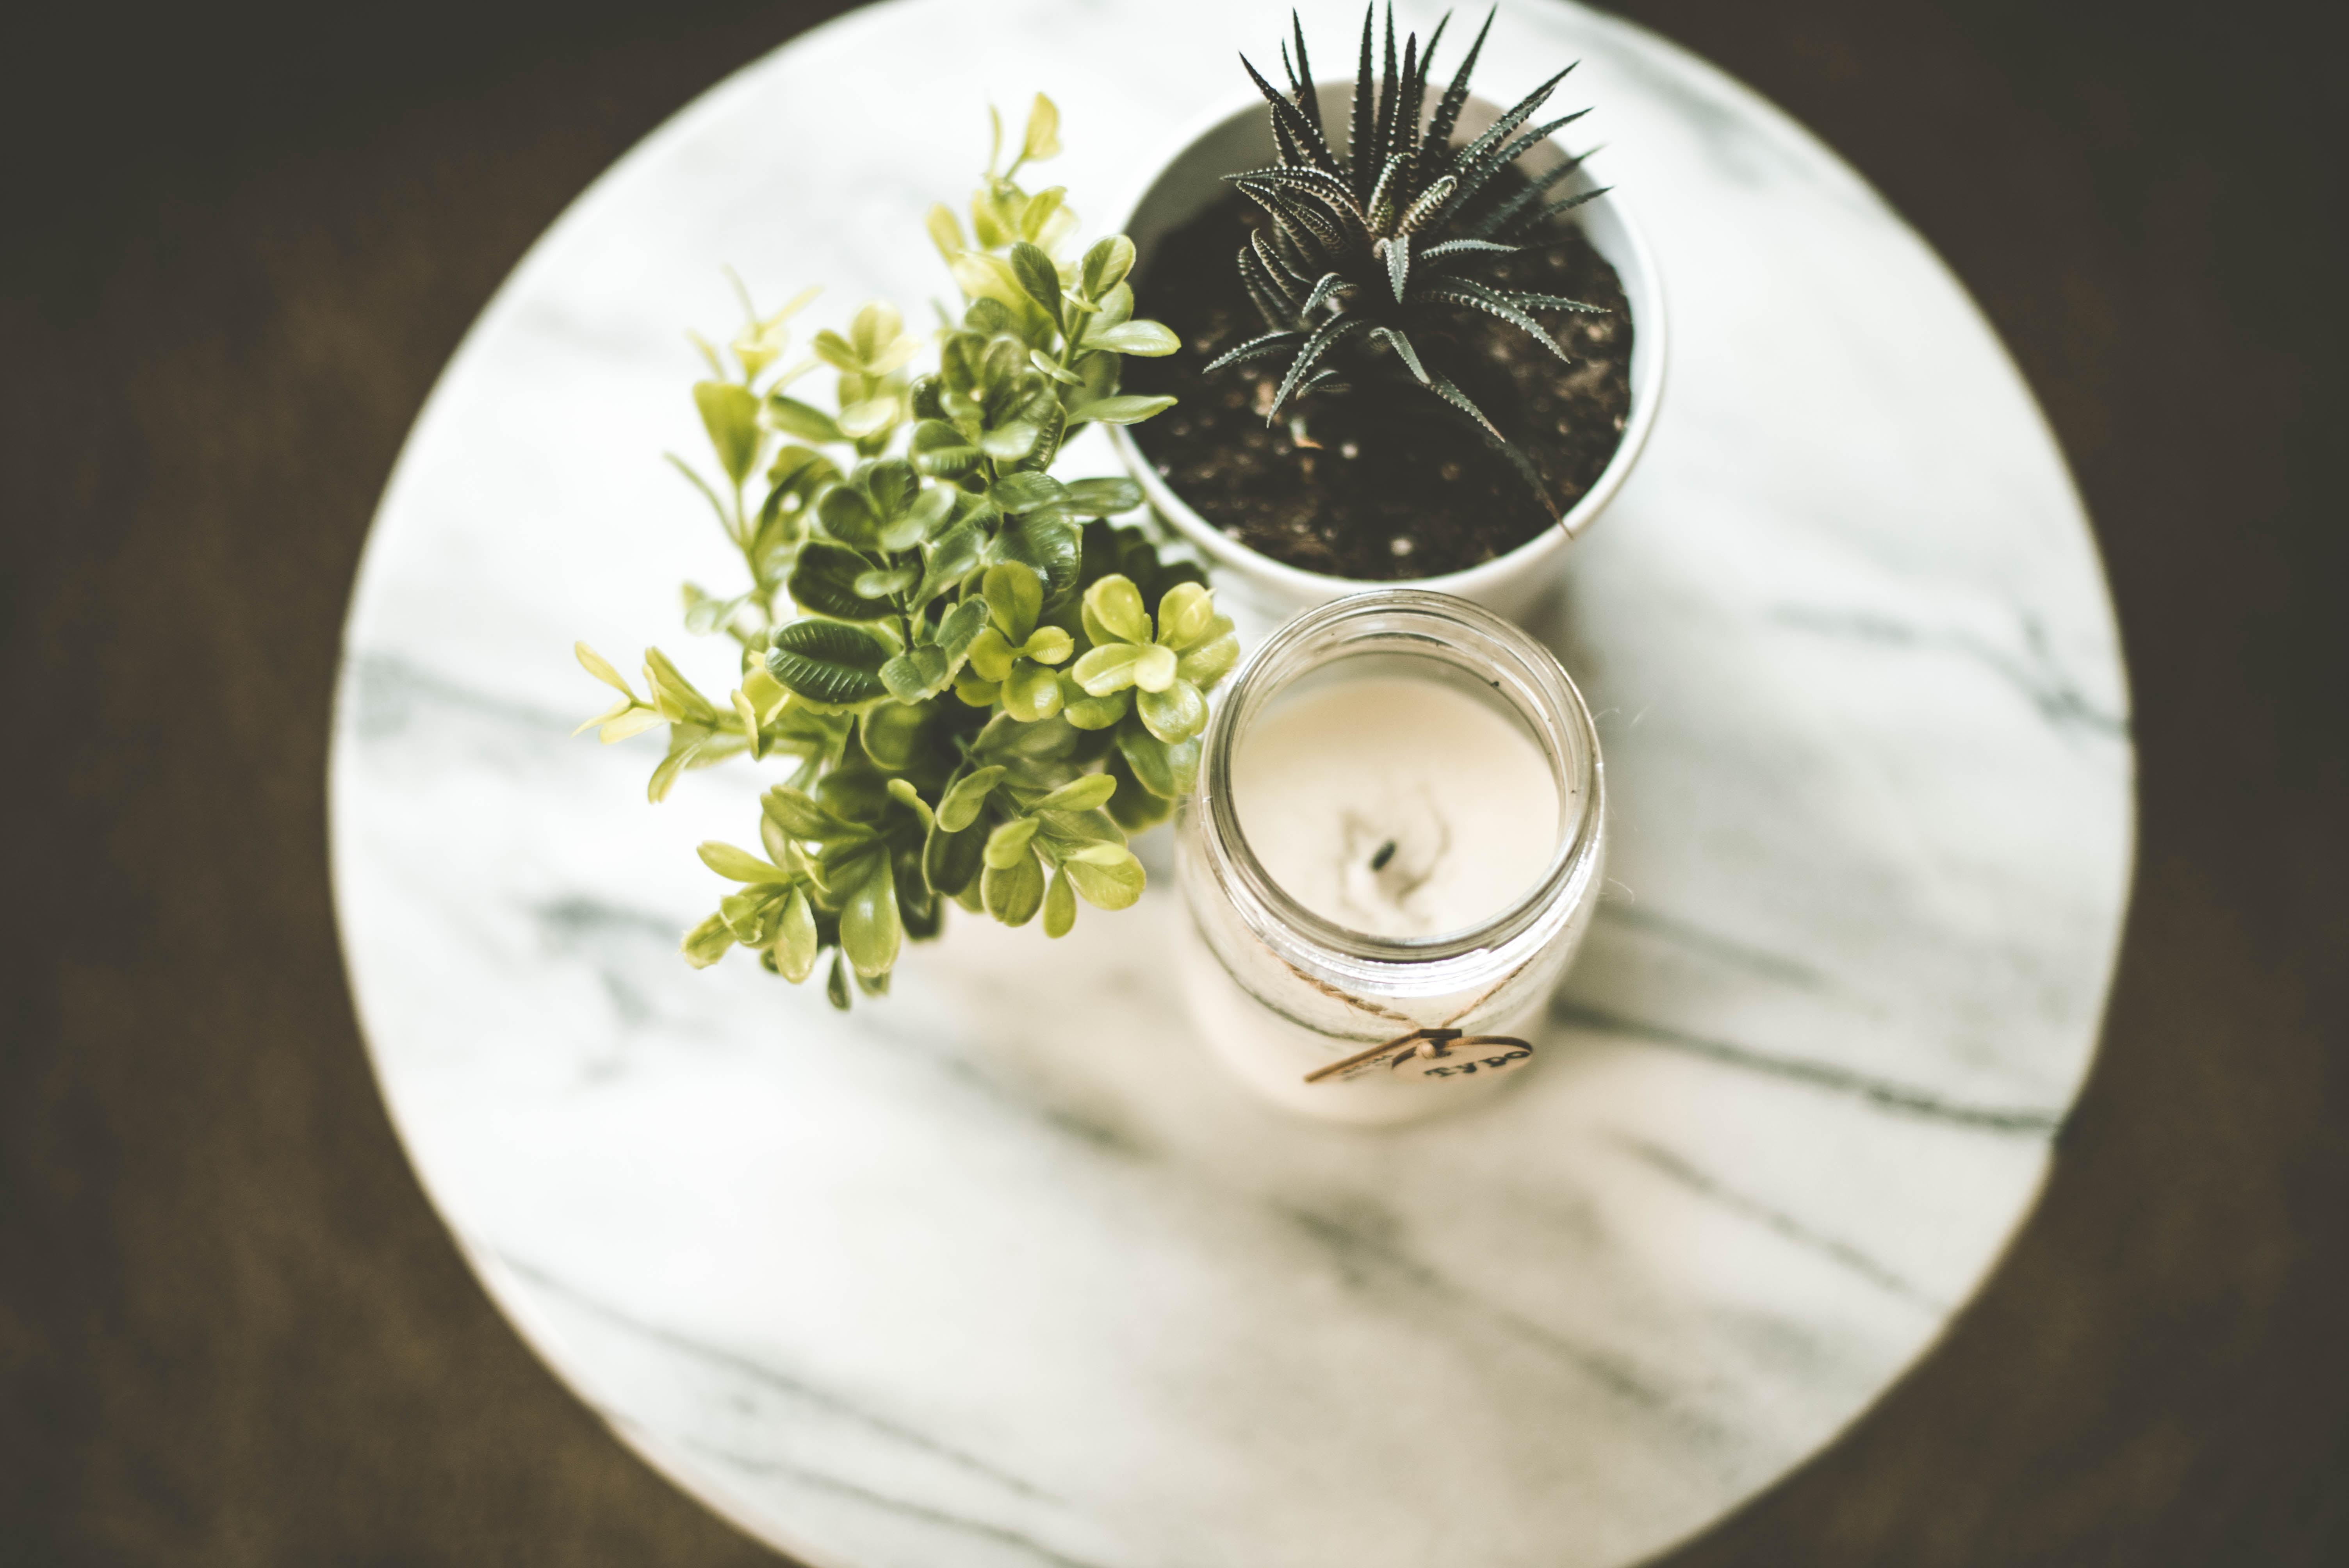 7 Simple Ways to Turn Around a Bad Day | milk tea mama